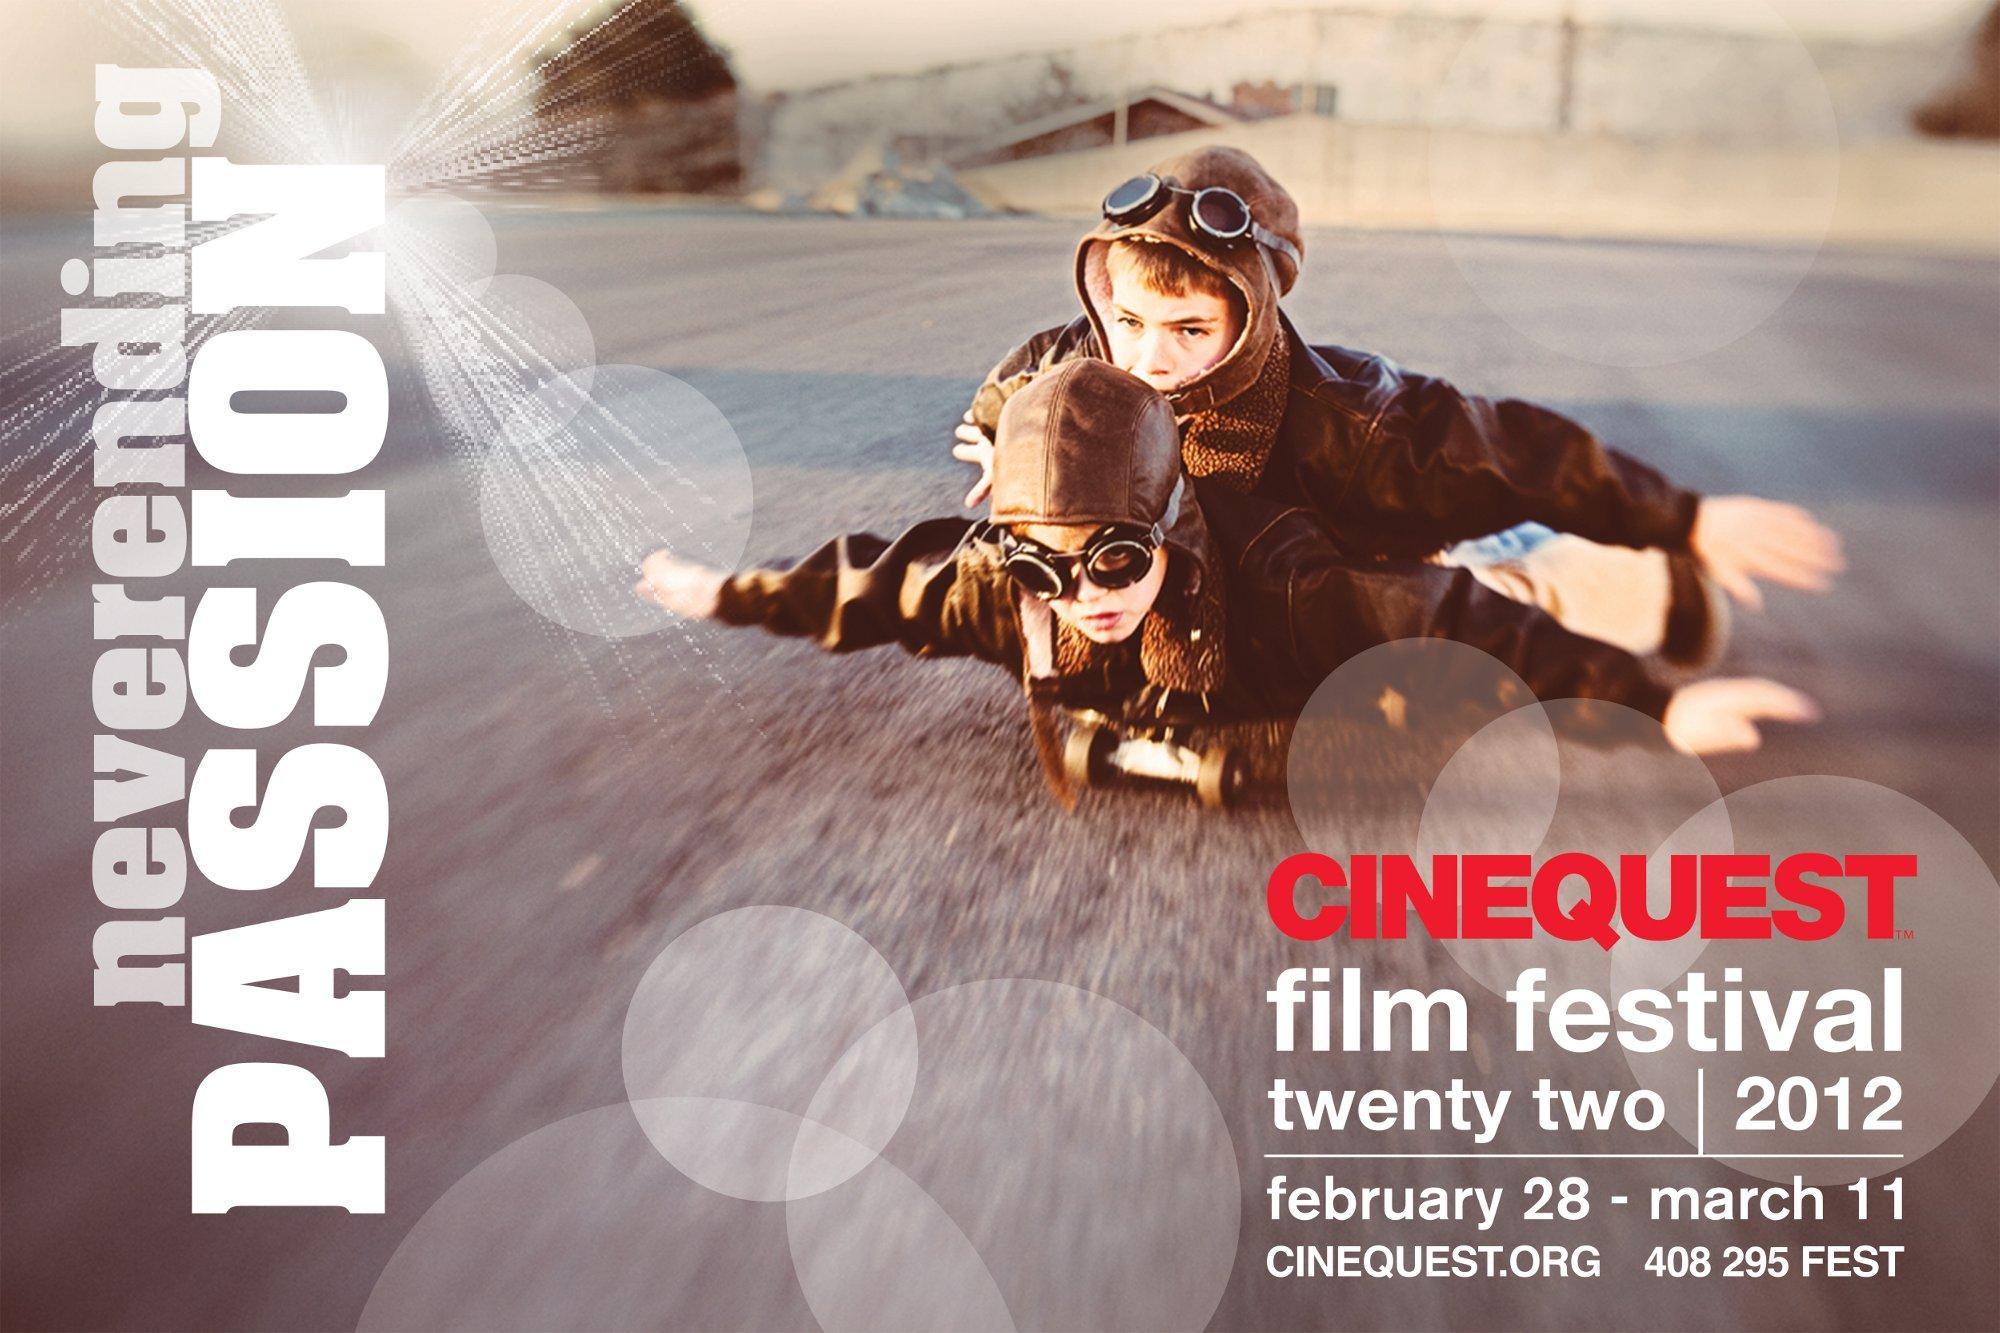 It's Cinequest Time Again!